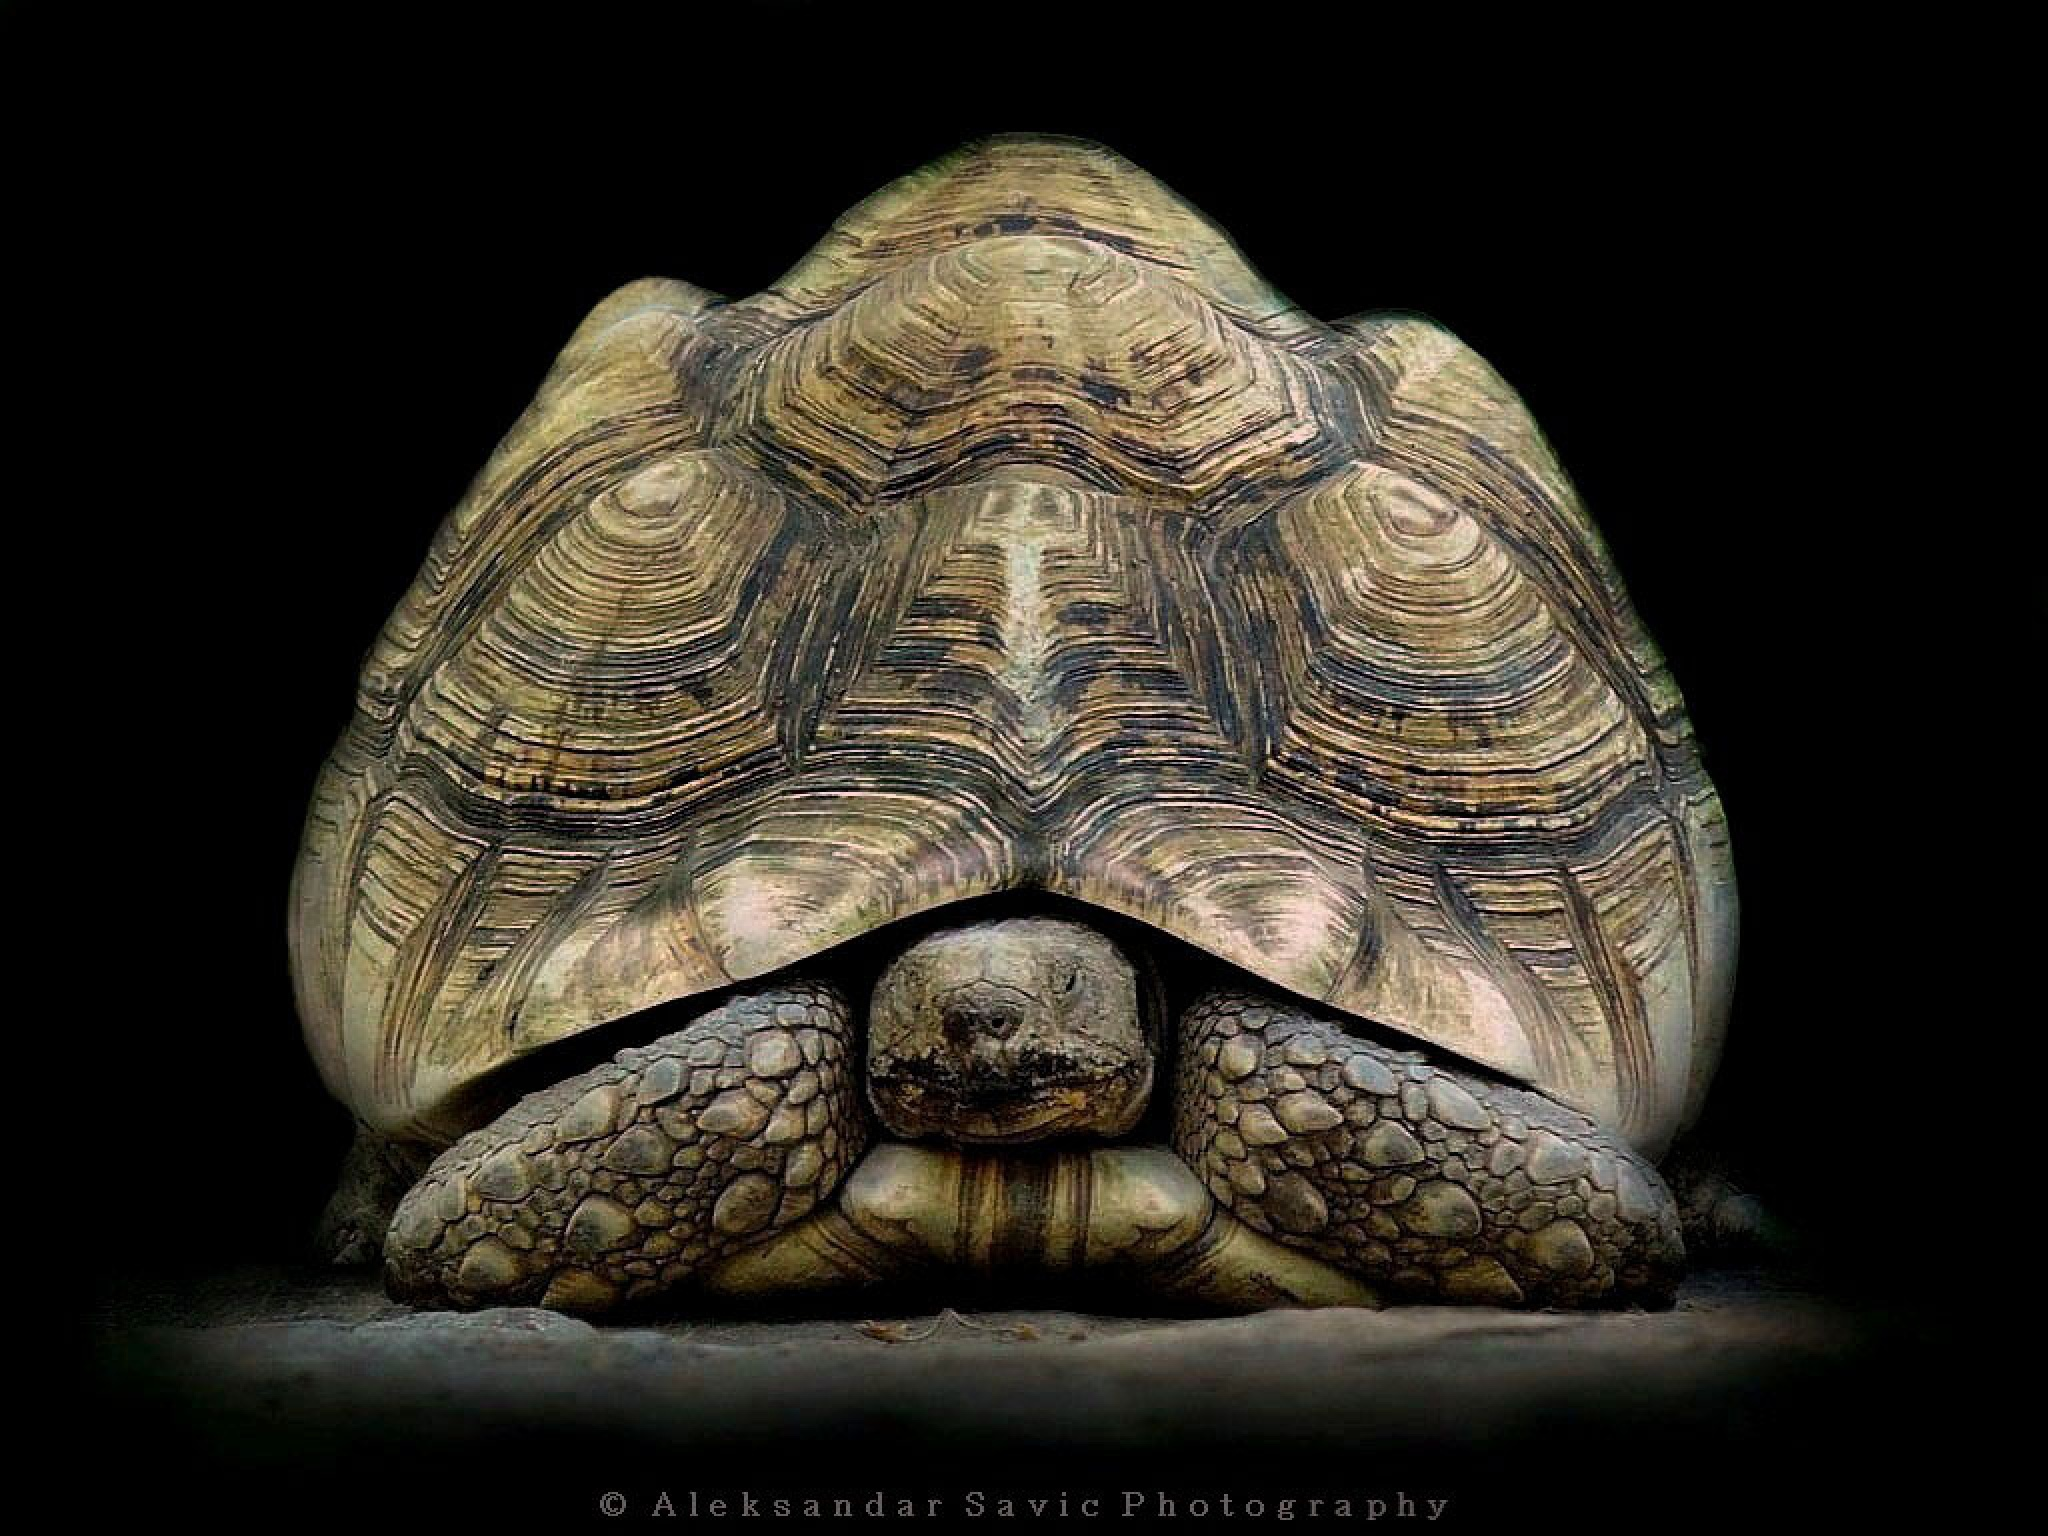 Leopard Tortoise by Aleksandar Savic